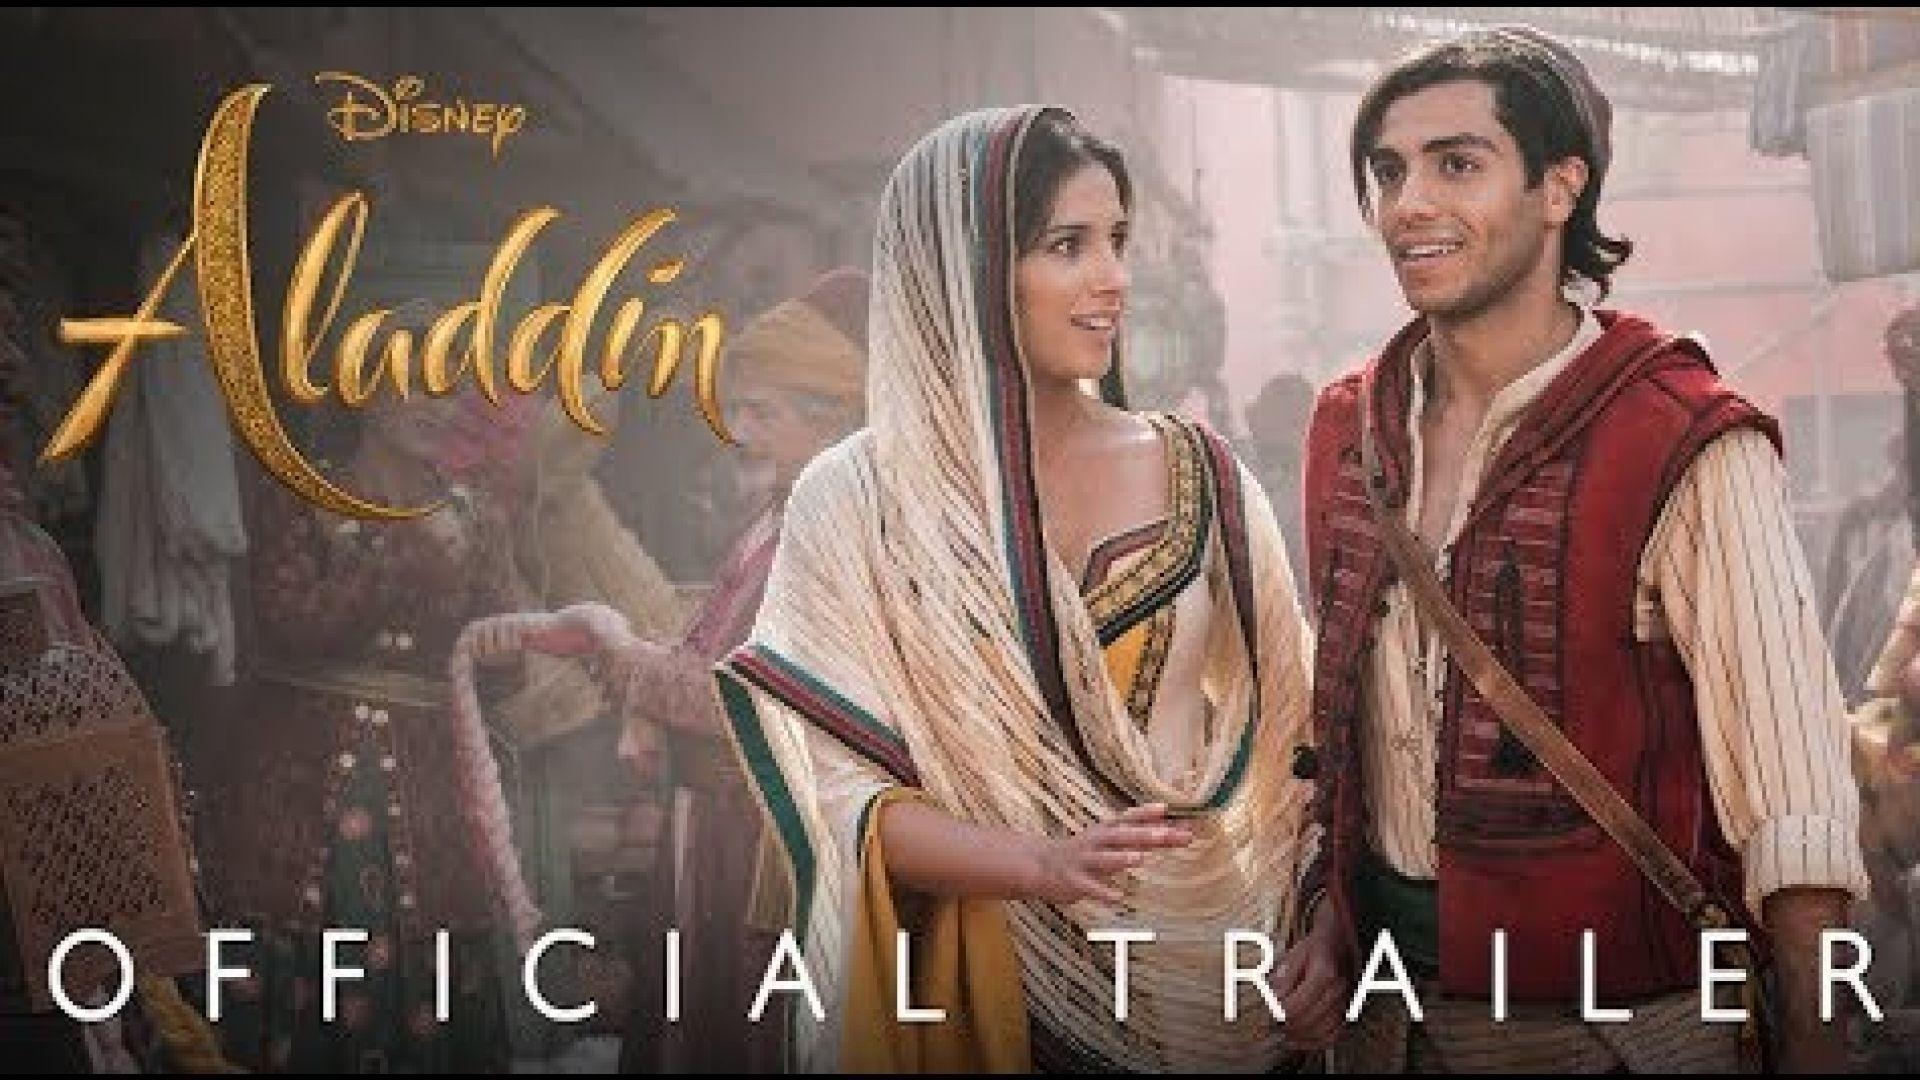 Disney's 'Aladdin' Trailer